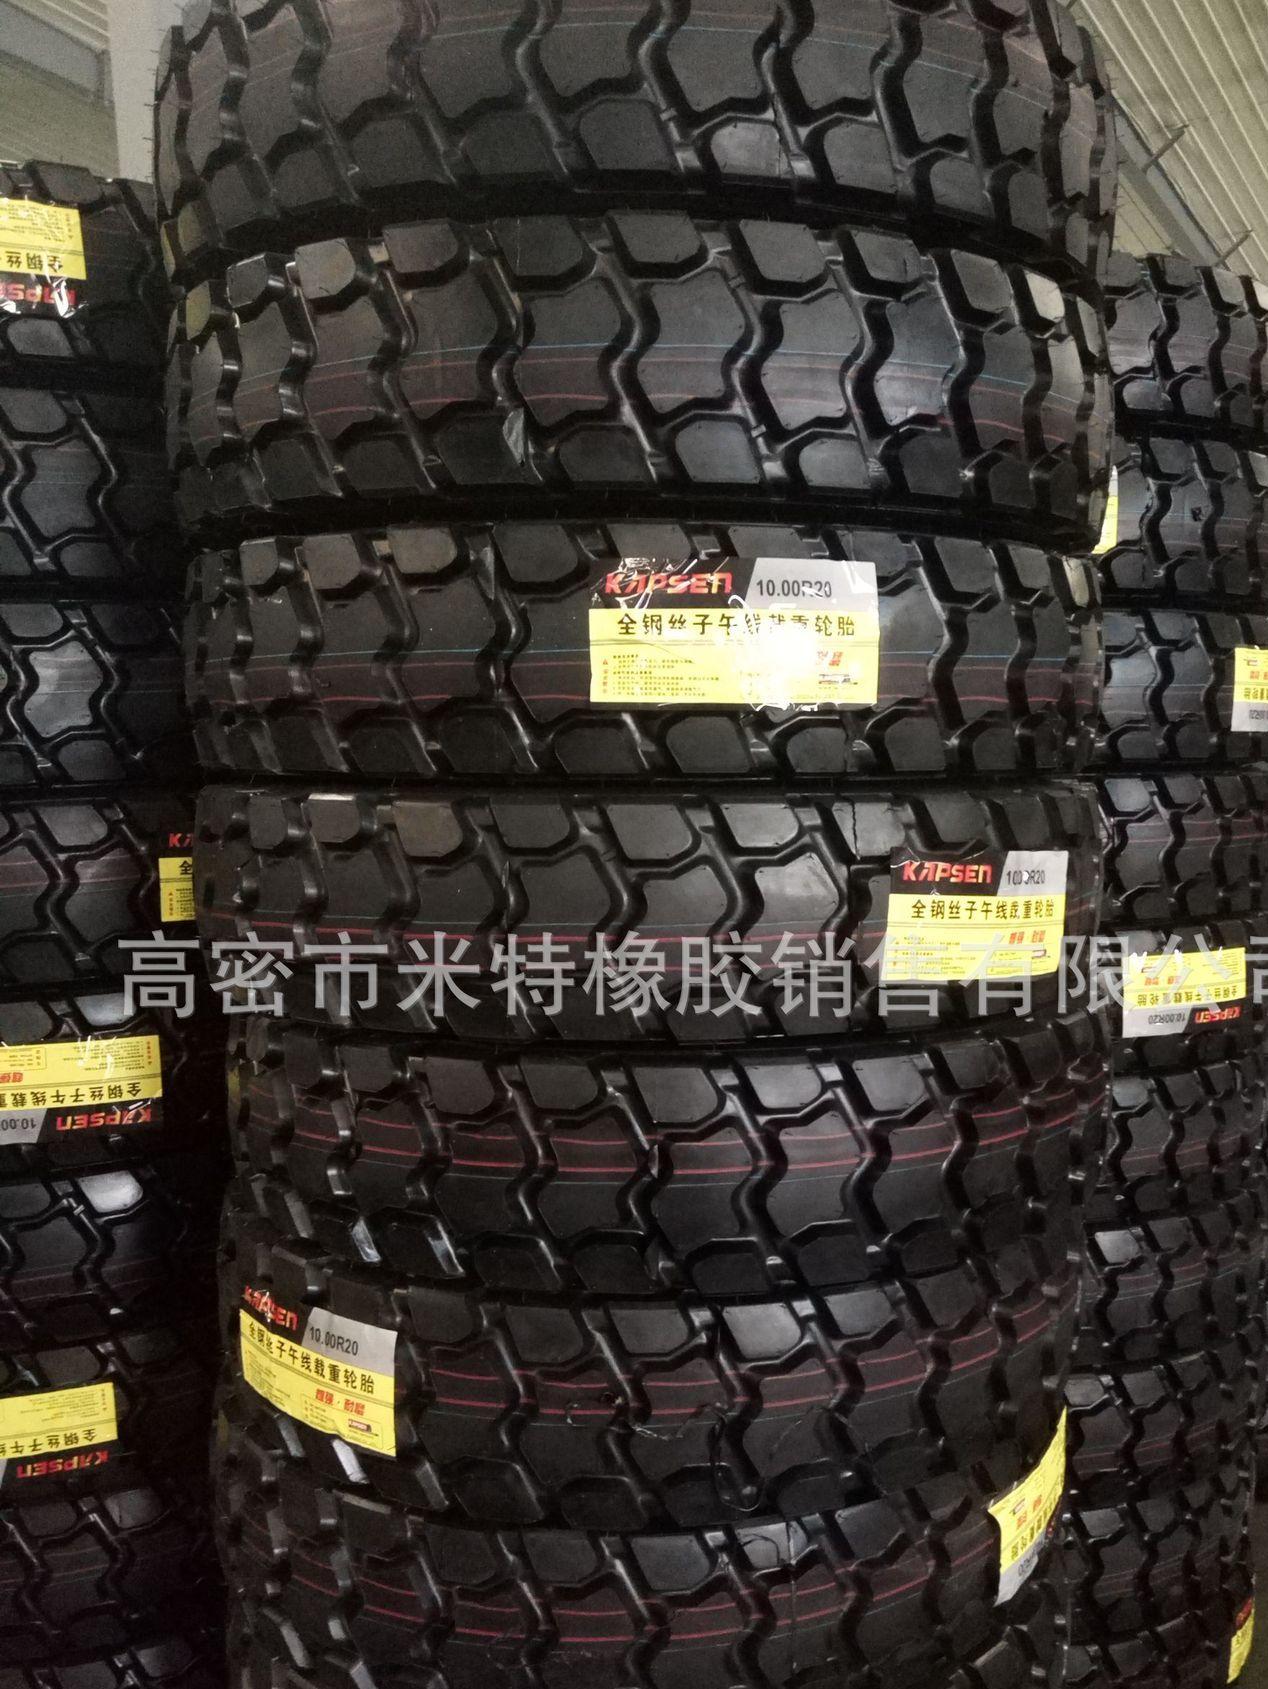 1000R20马蹄块花纹 载重型 卡车工程轮胎 大量批发 优质耐磨